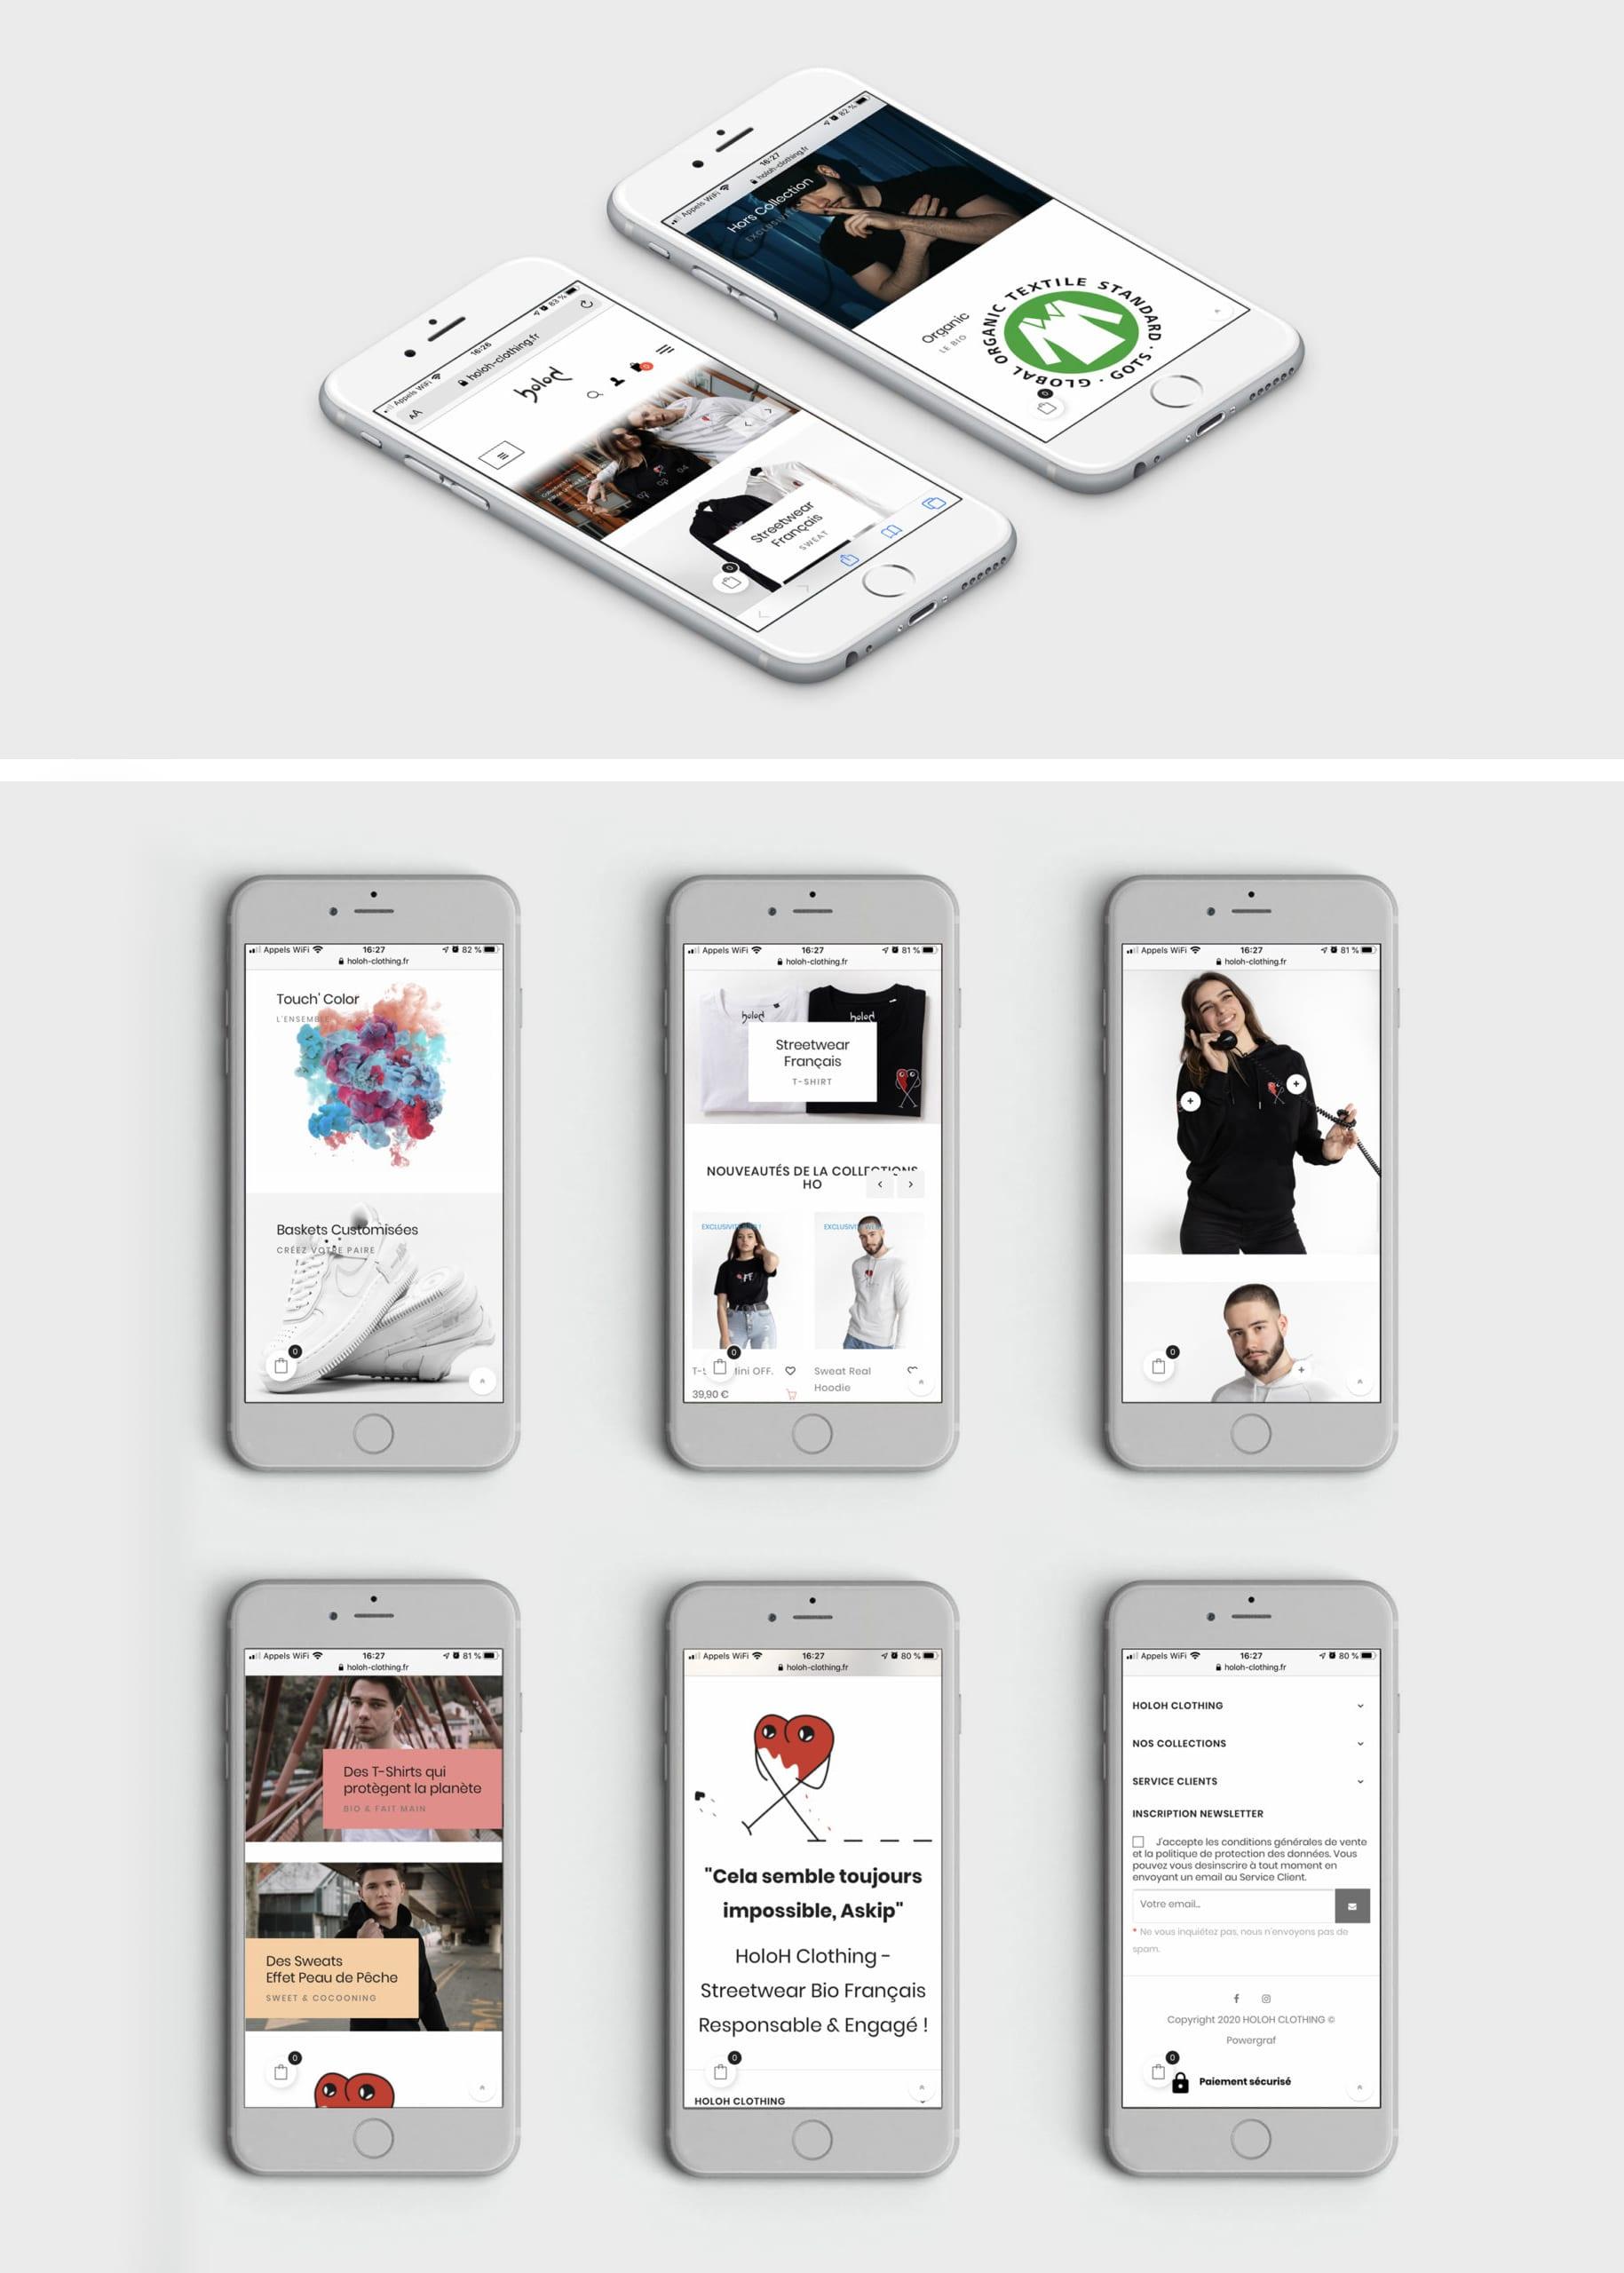 HoloH Clothing - Smartphone